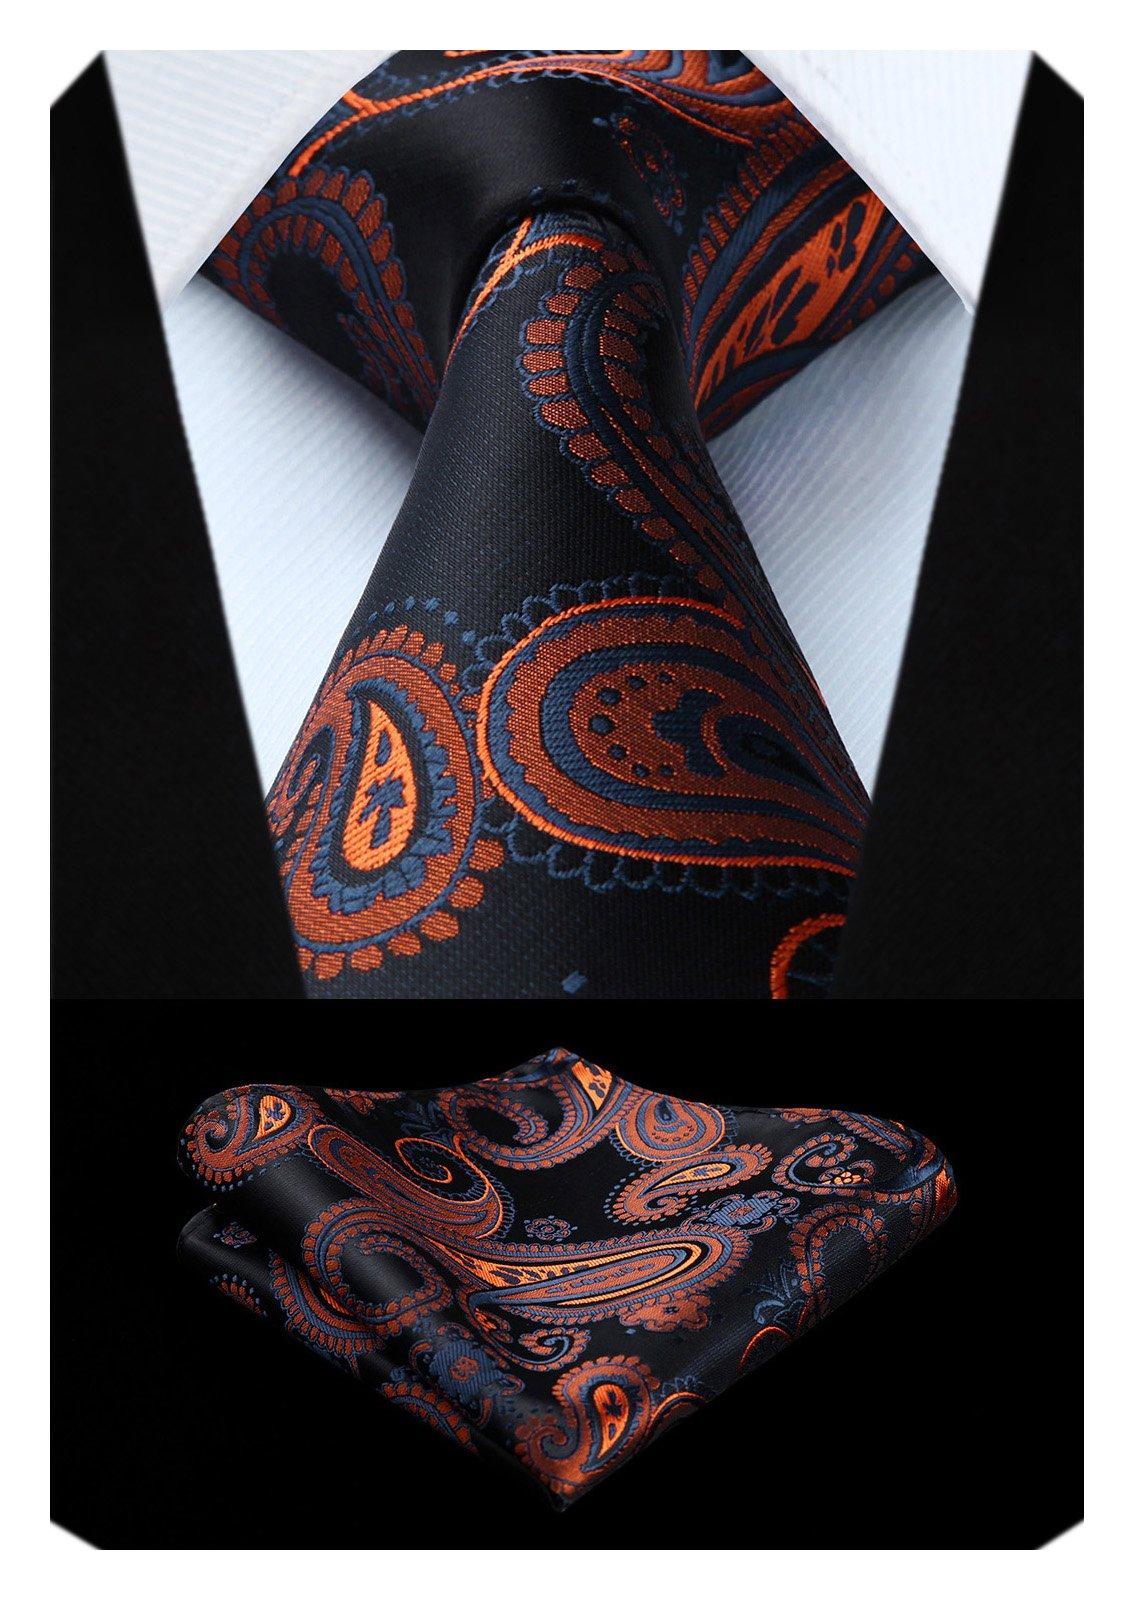 5c499329b362 HISDERN Paisley Floral Tie Handkerchief Wedding Party Woven Classic Men's  Necktie & Pocket Square Set Black